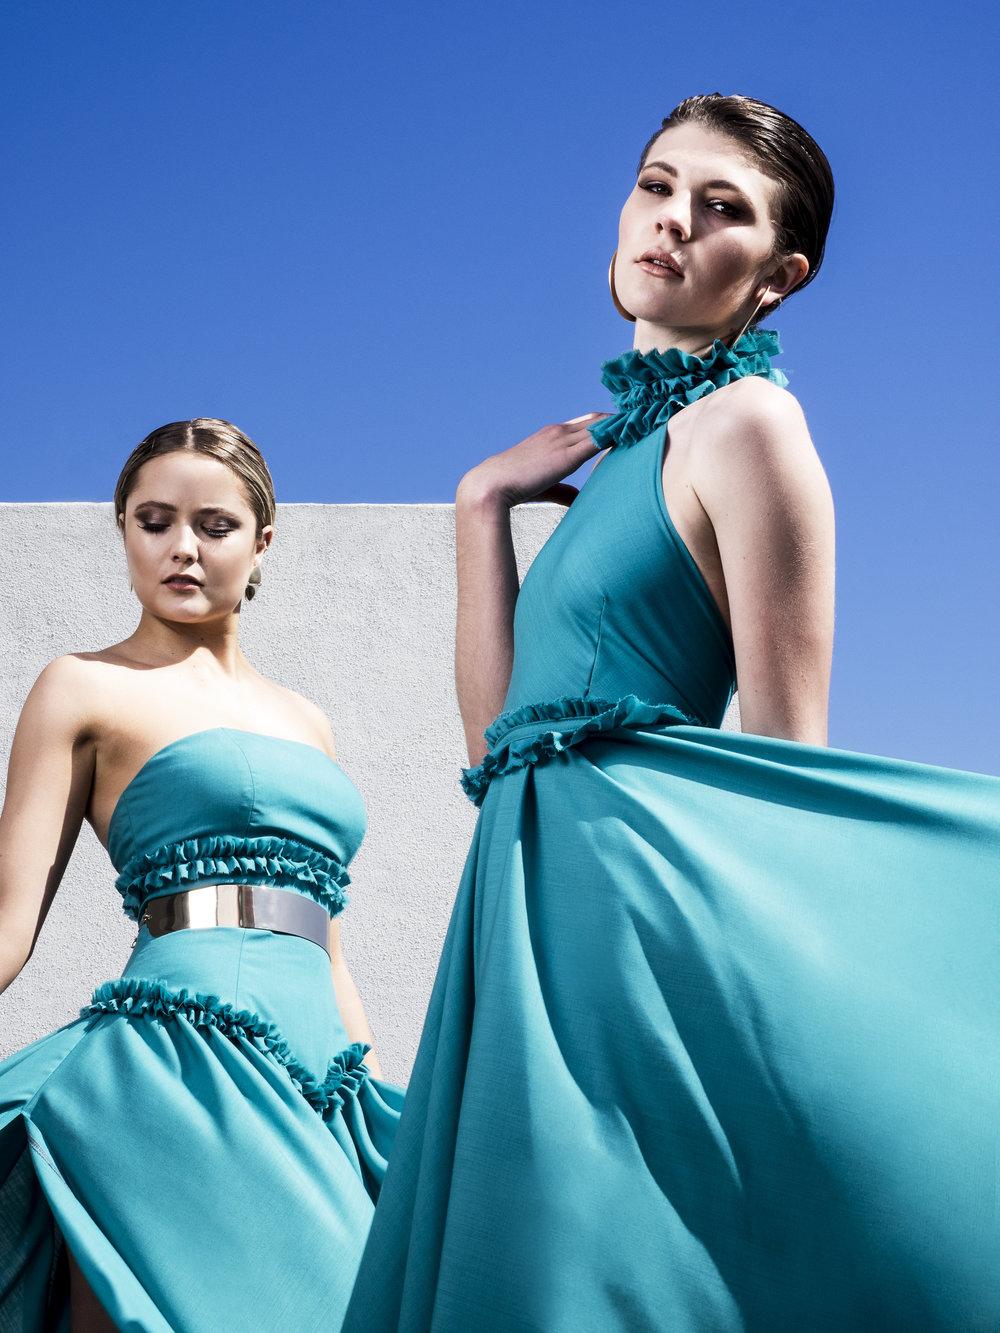 Photo: Alec Morris. Models: Jade Meyers, Annagh Weston. Makeup: Tash Pascoe